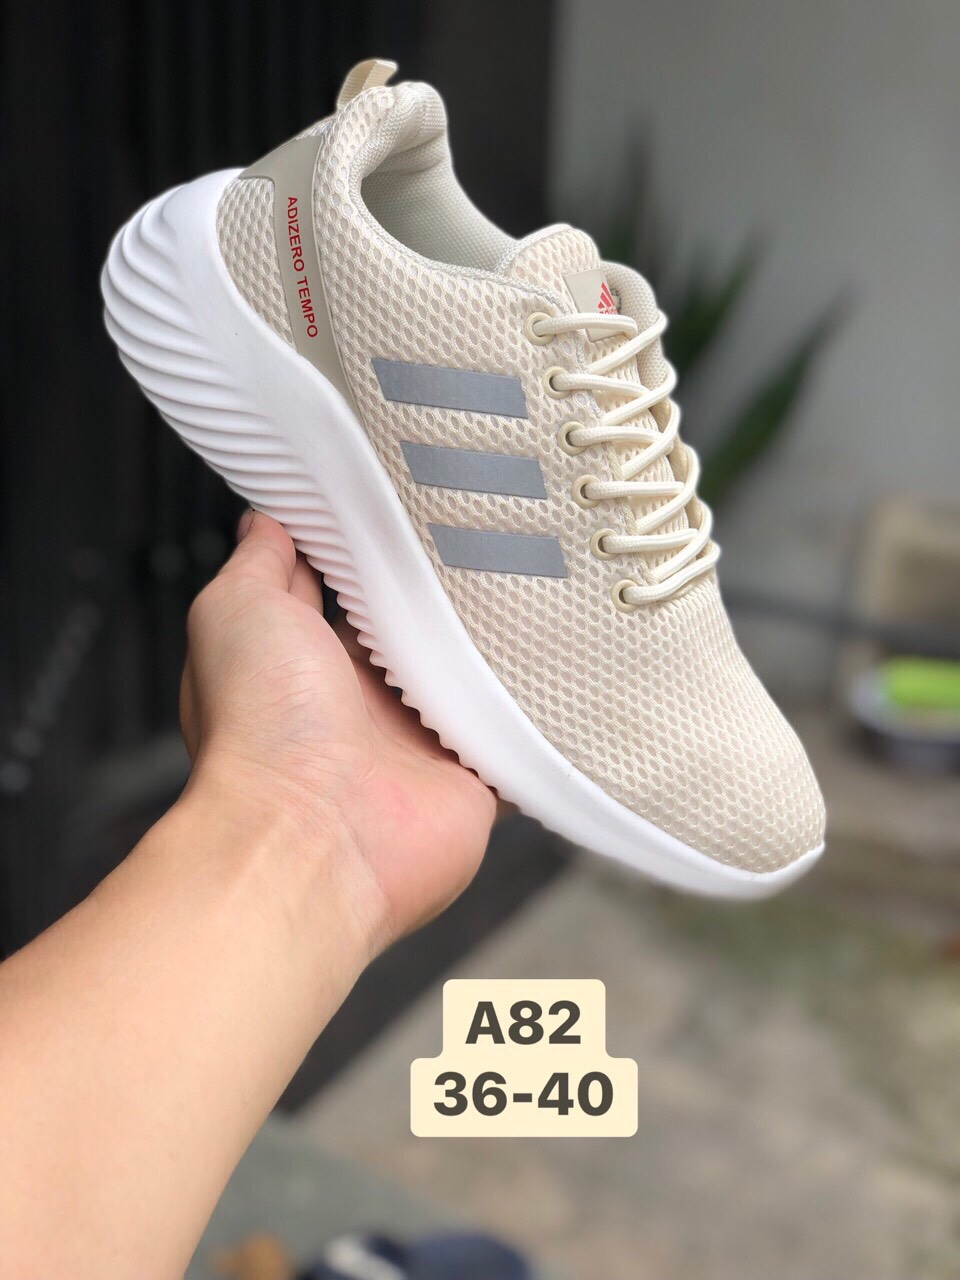 Giày Adidas Neo A82 màu kem